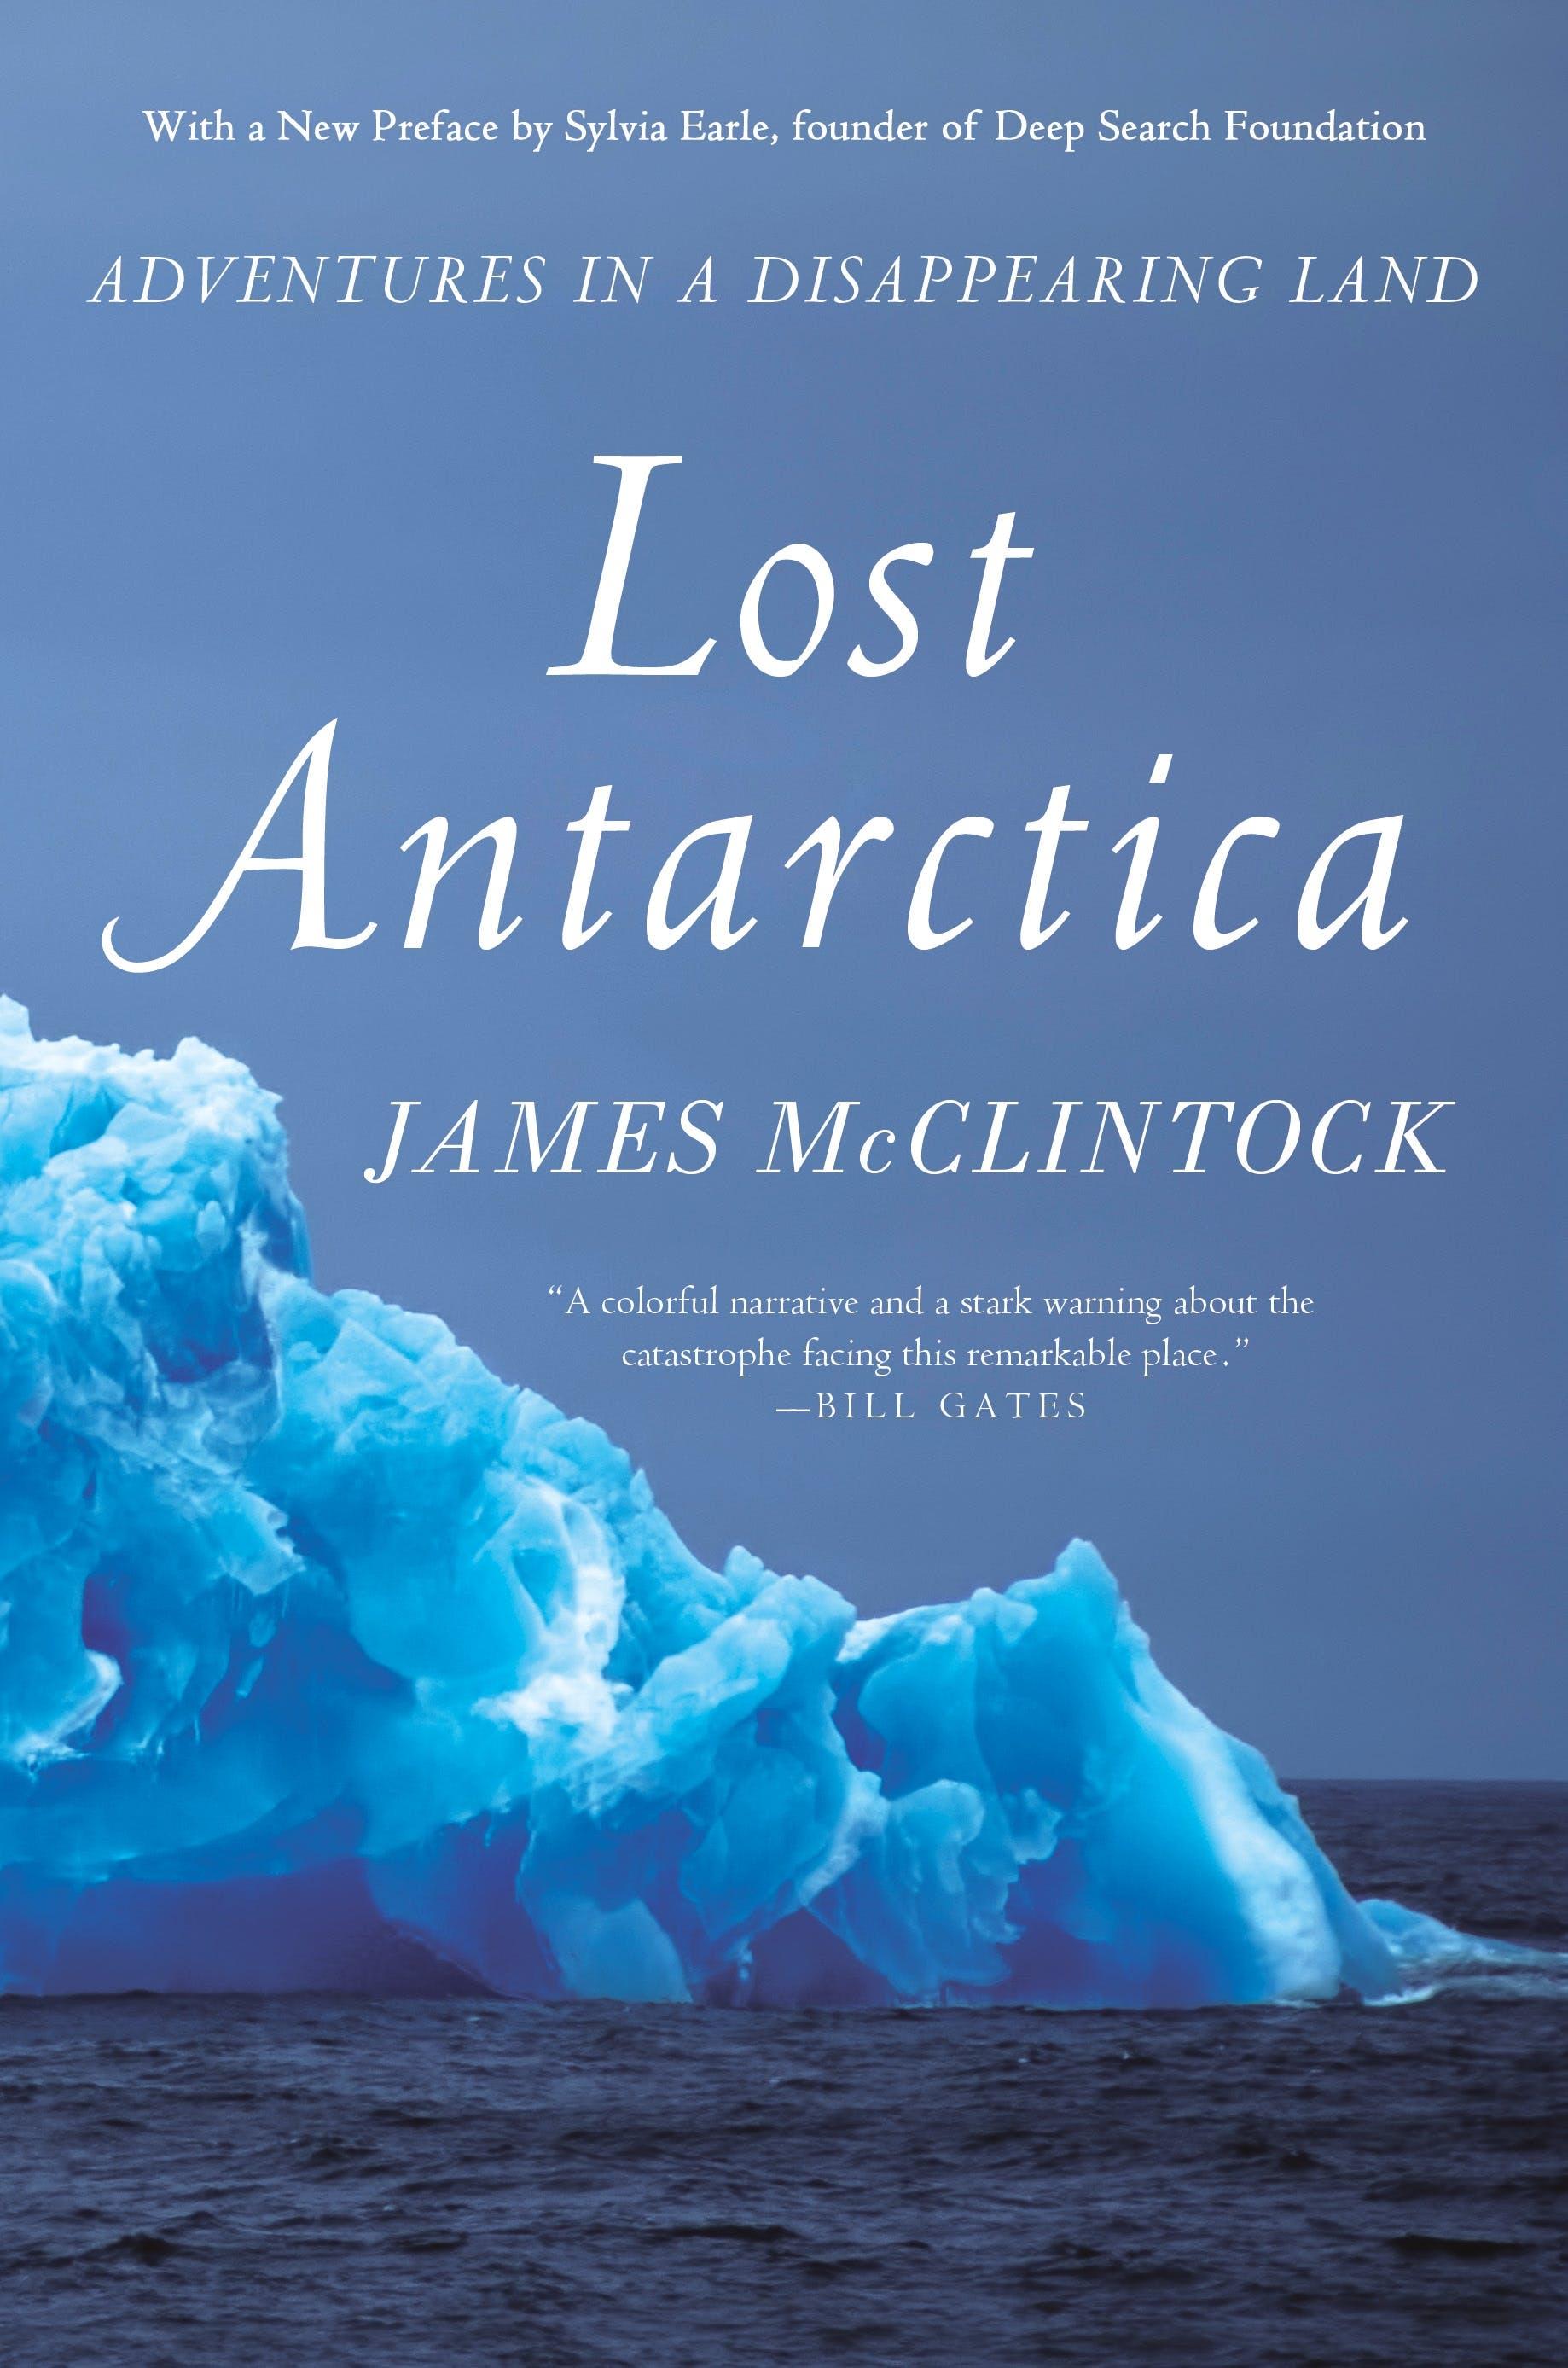 Image of Lost Antarctica